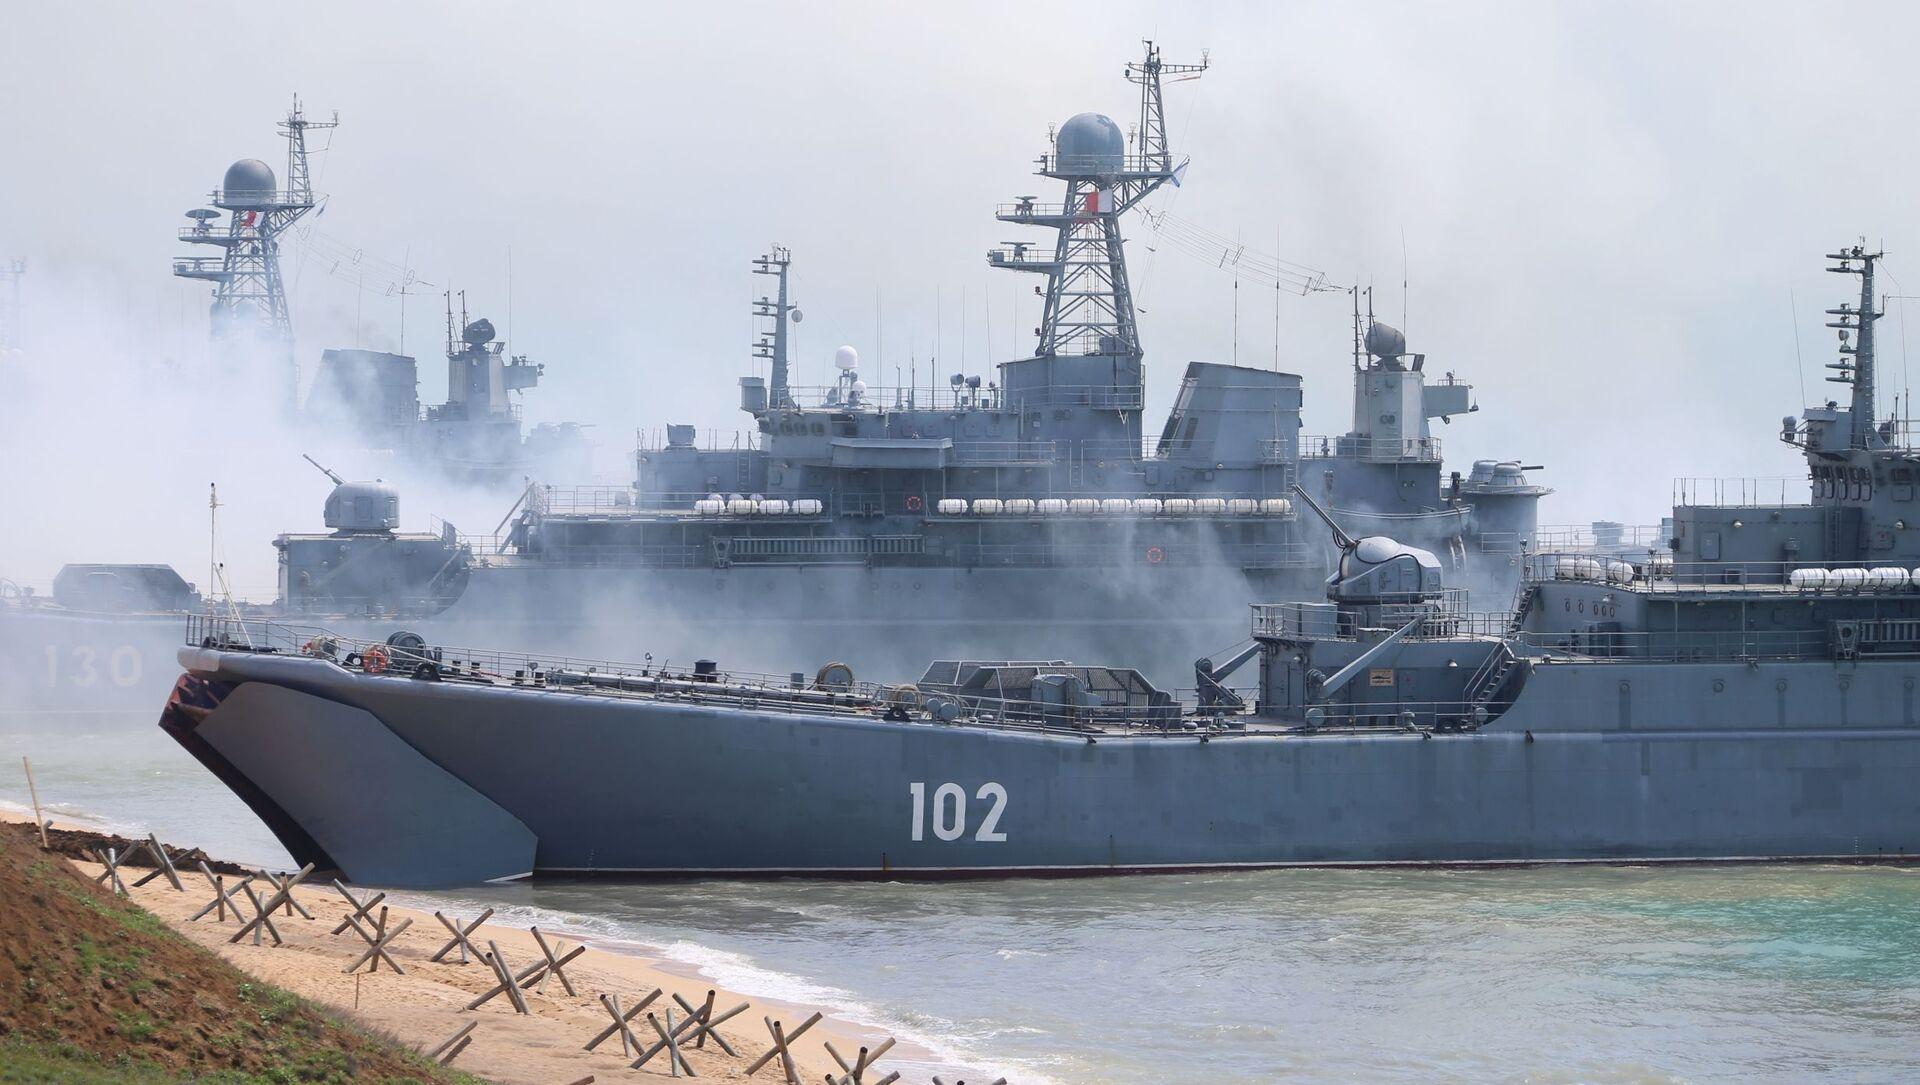 Des exercices militaires en Crimée, avril 2020 - Sputnik France, 1920, 25.06.2021